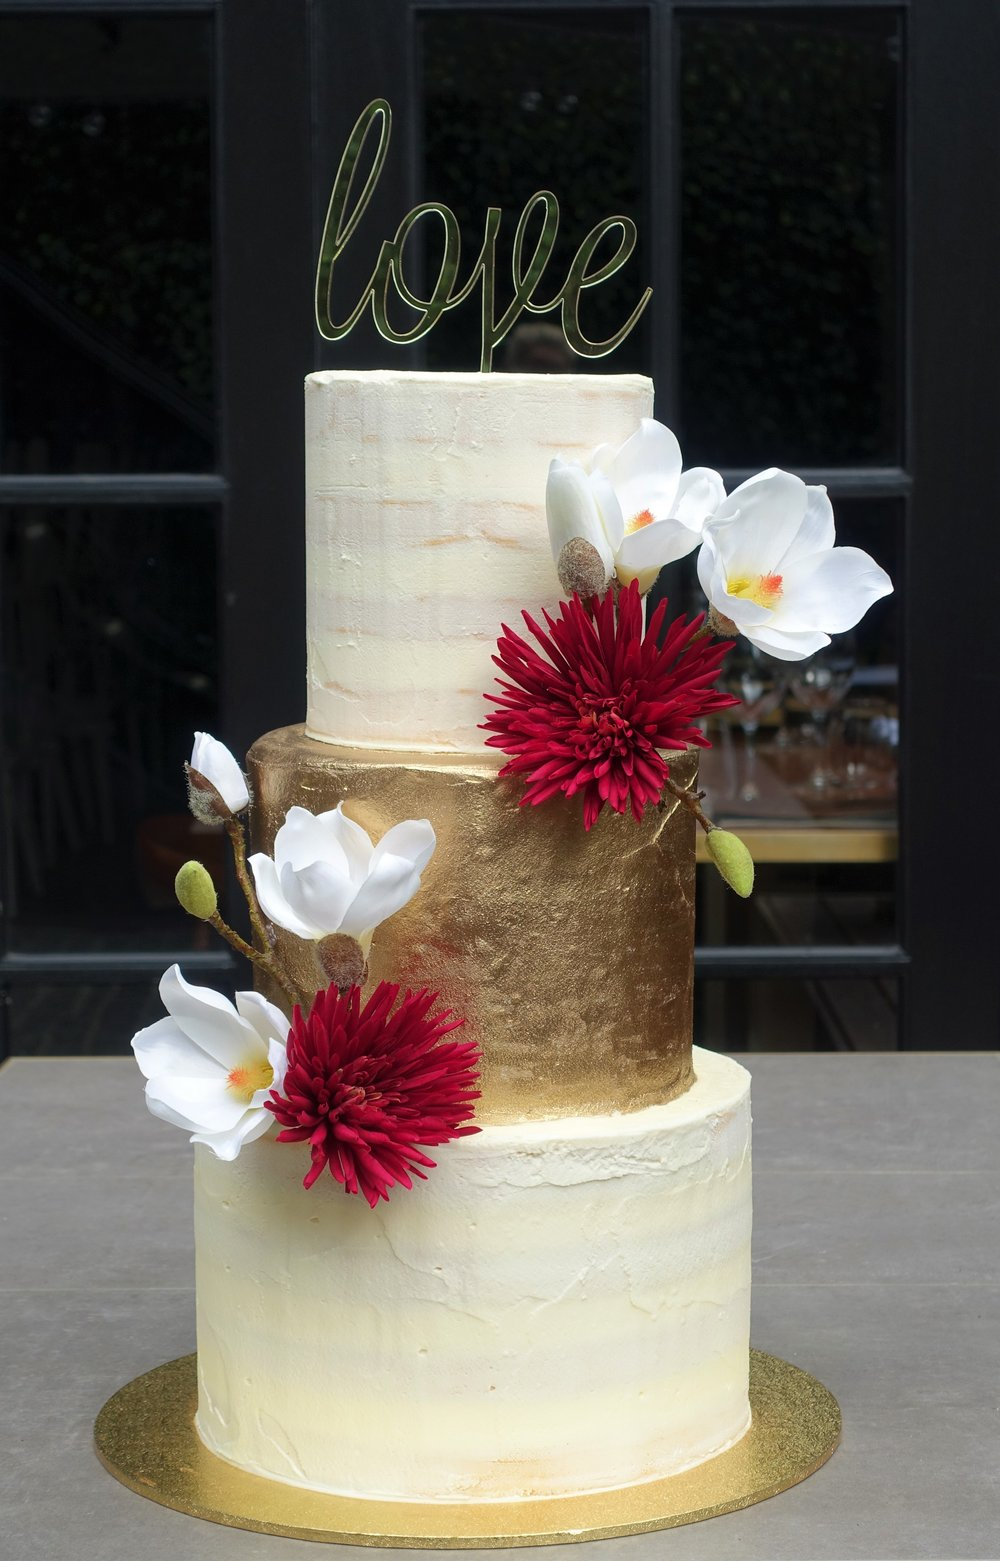 vanillapod-weddingcake-floral.JPG